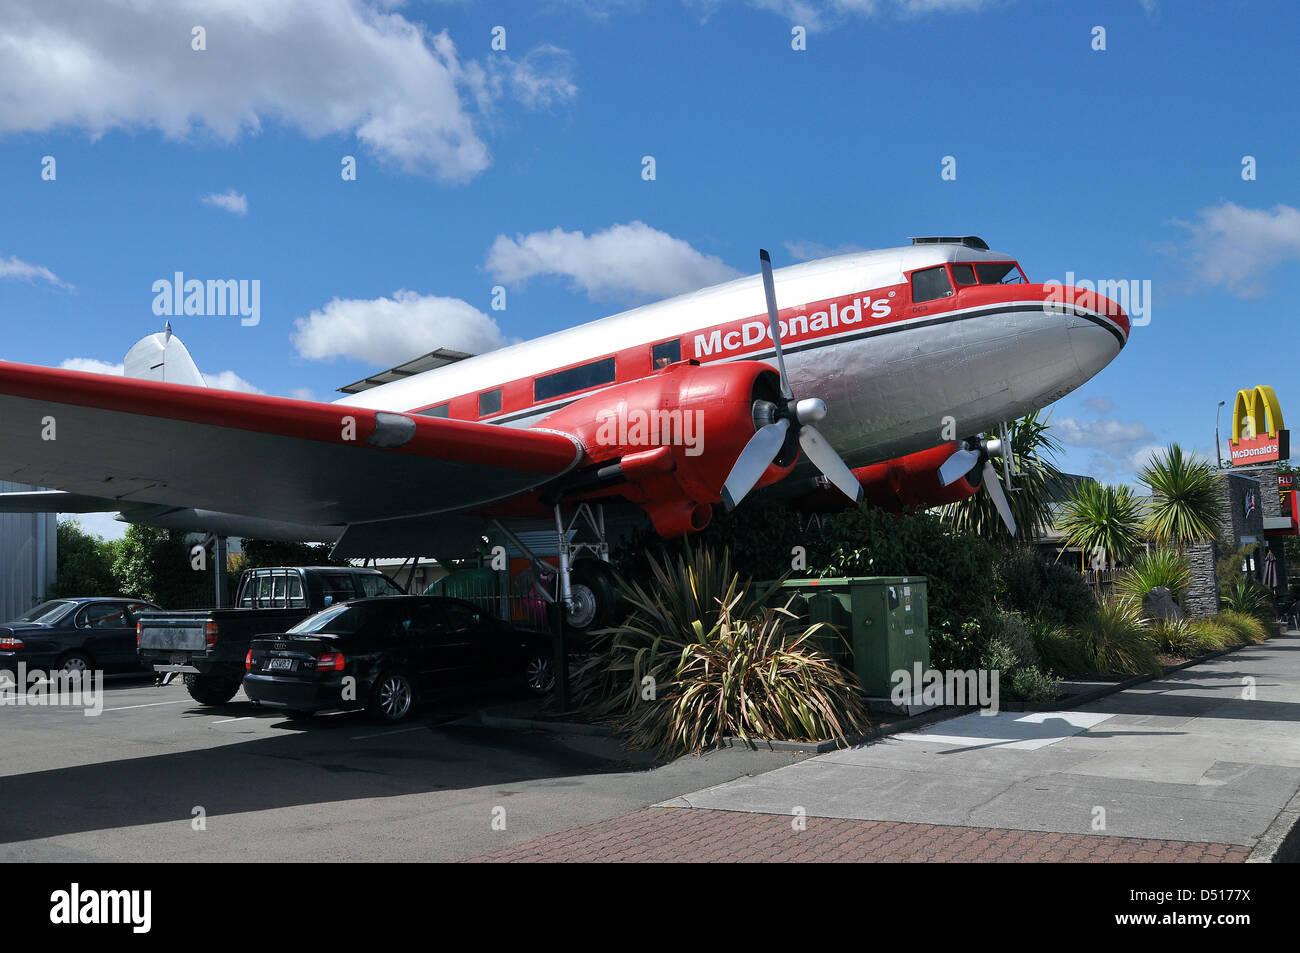 mcdonalds-plane-a-douglas-dc-3-dakota-converted-for-use-as-part-of-D5177X.jpg